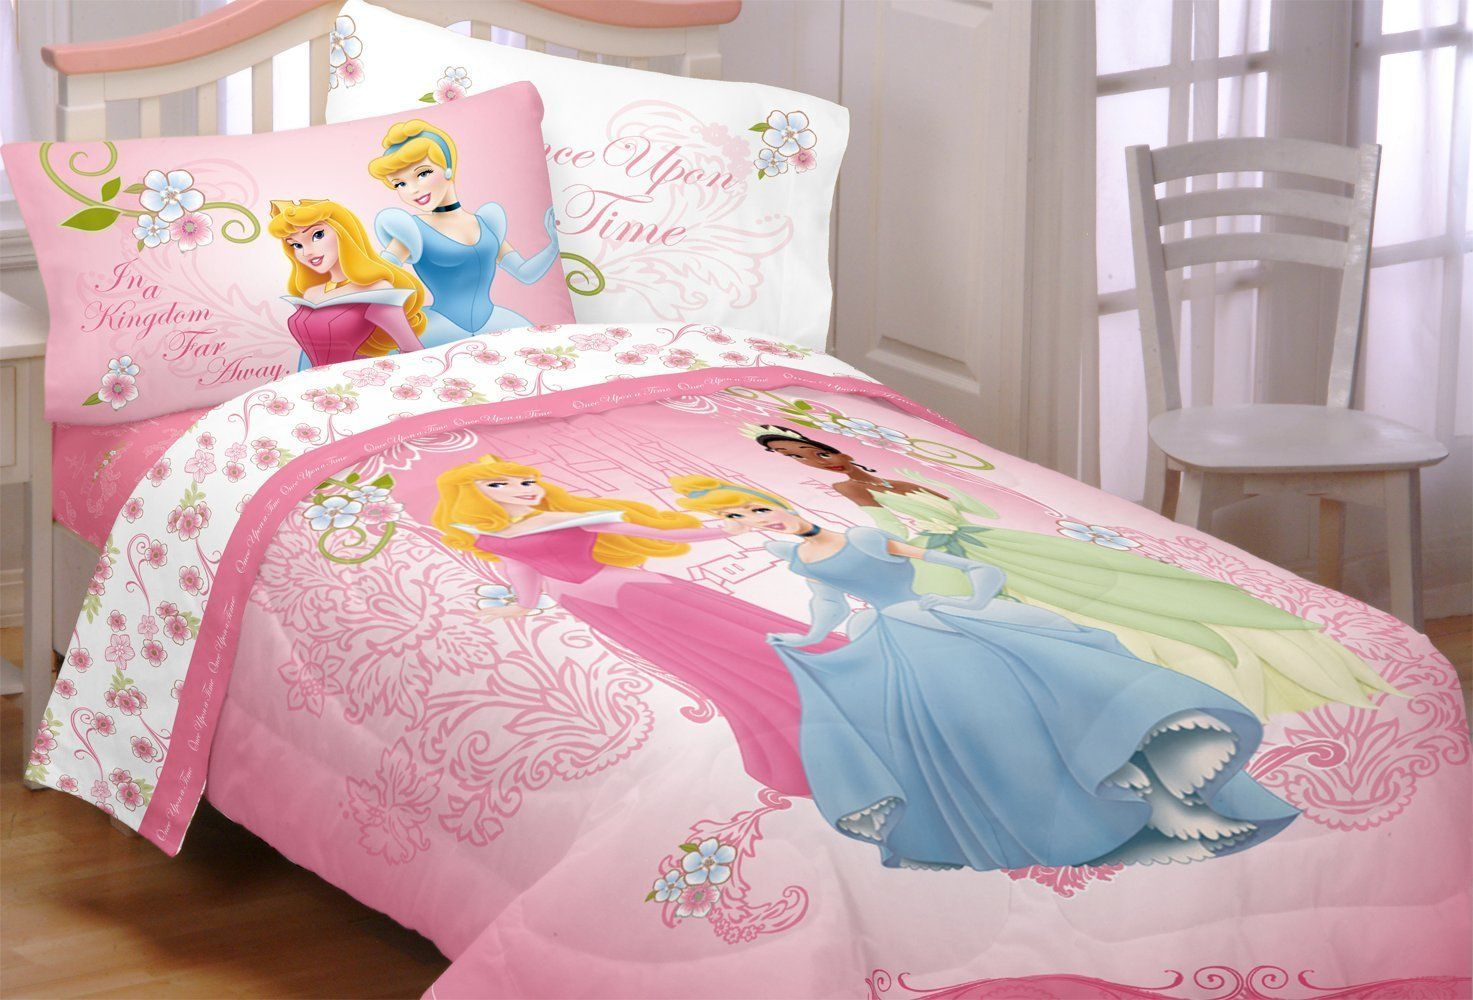 amazon disney princesses your royal grace twinfull